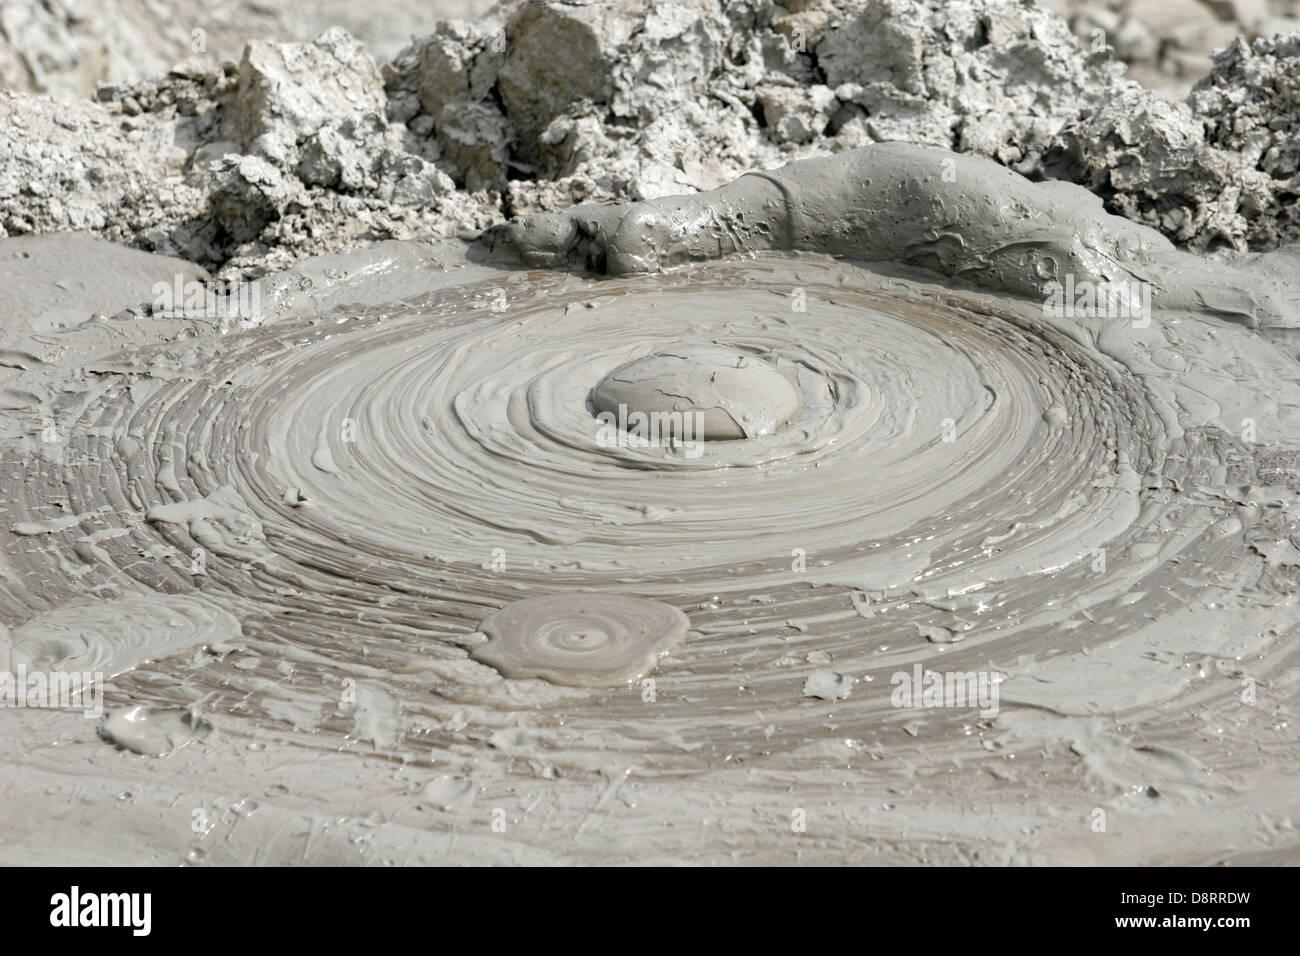 Mud volcanoes in Qobustan near Baku Azerbaijan - Stock Image